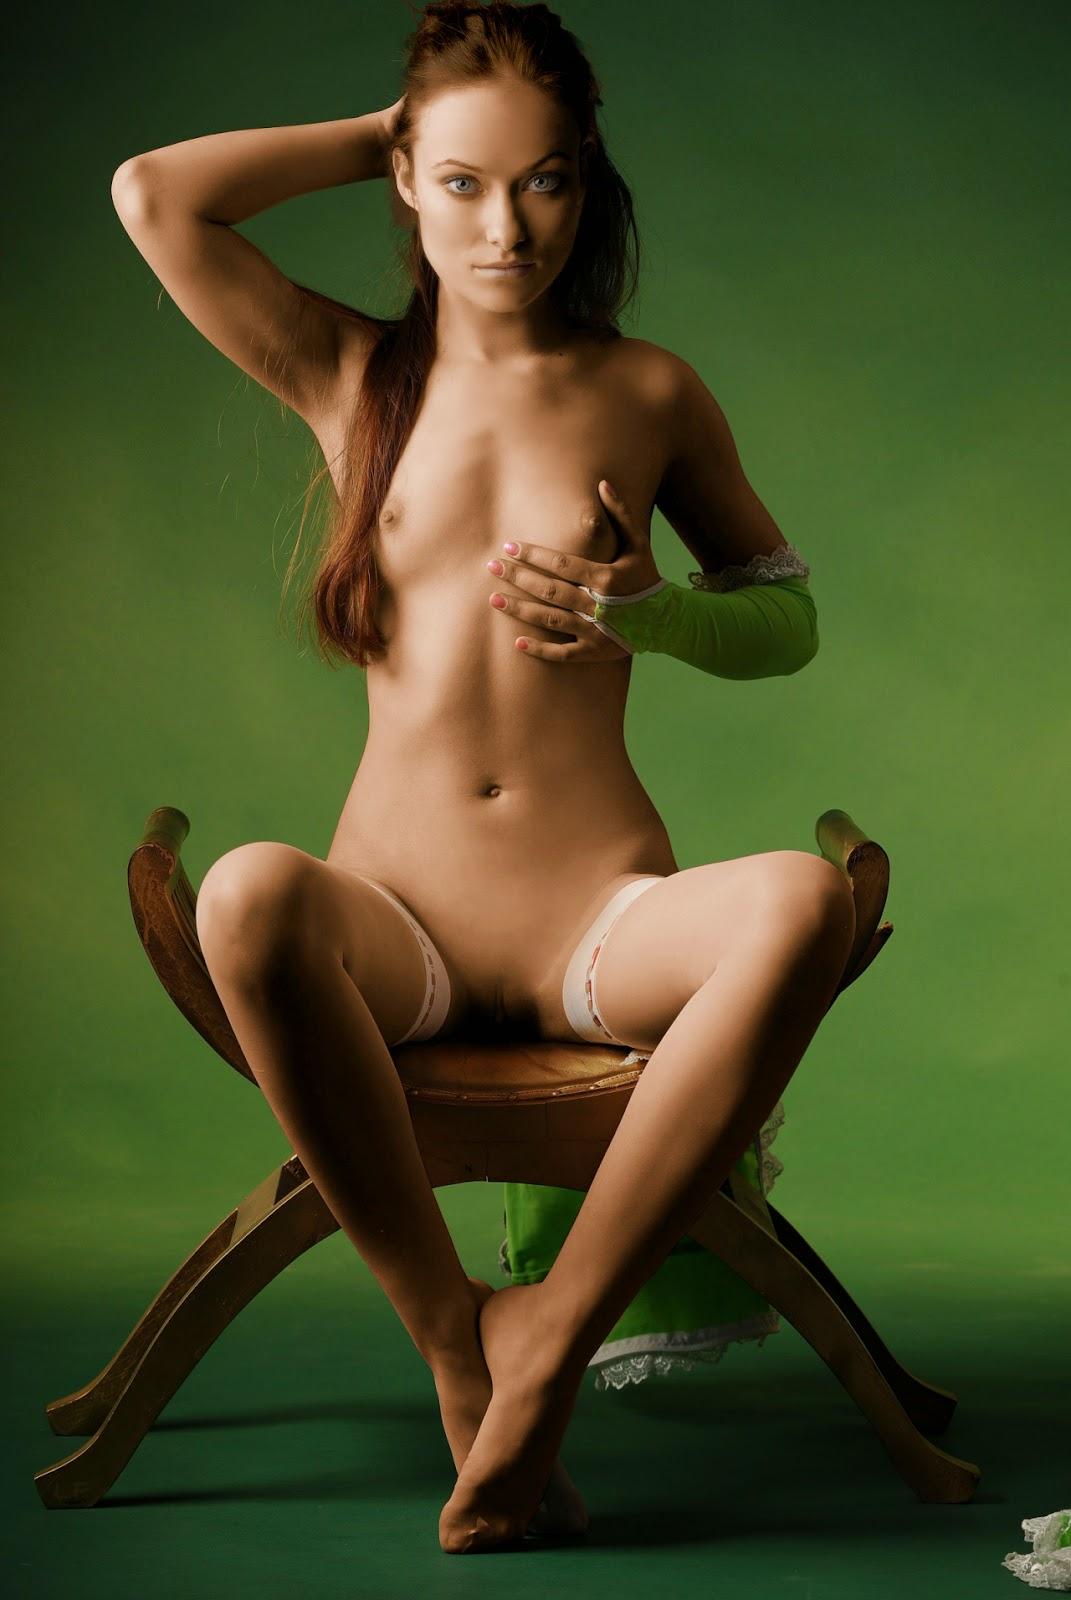 Sex Louisa Johnson Leaked Nude Gif